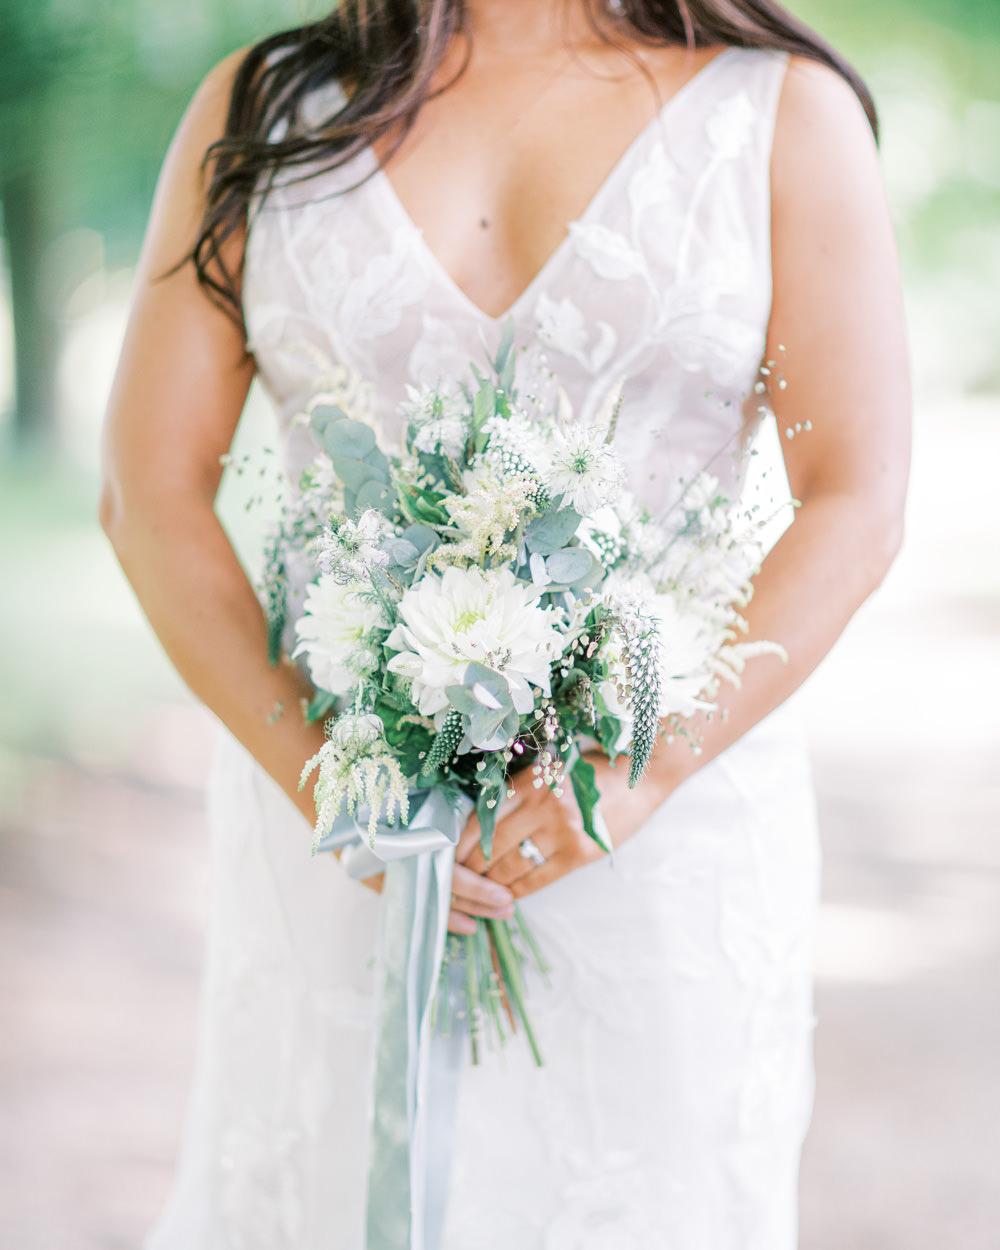 Bride Bridal Bouquet Flowers Blue White Family Elopement Ideas Sophie May Photo